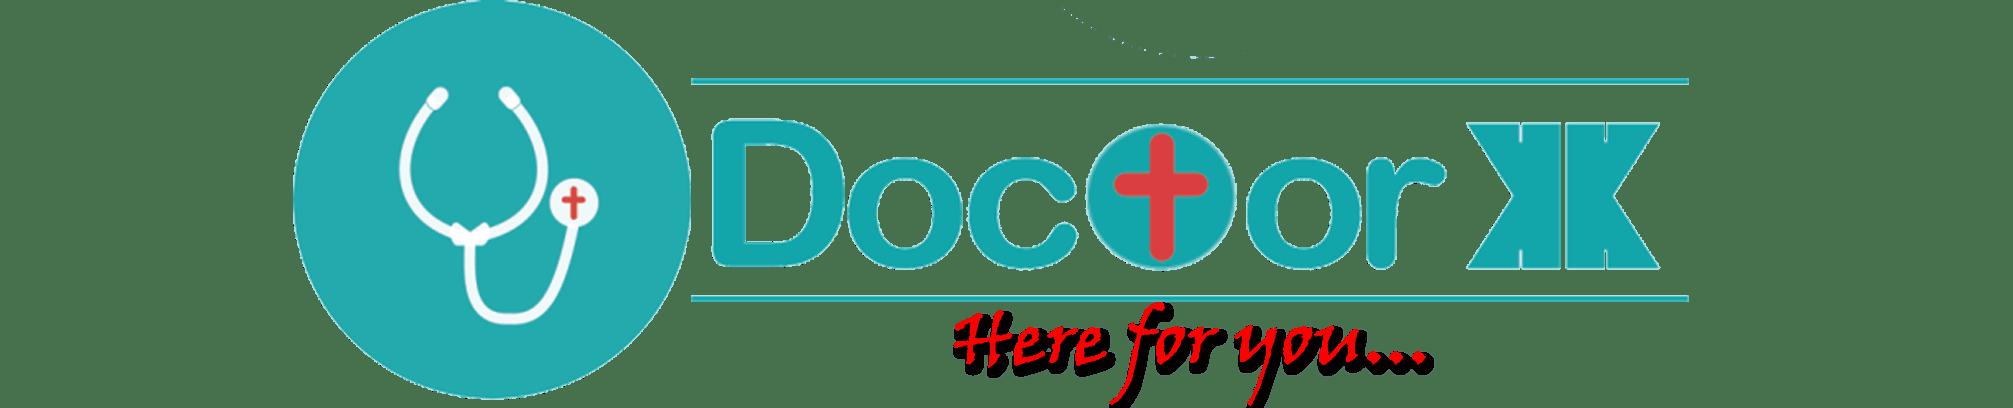 Doctorkk.com